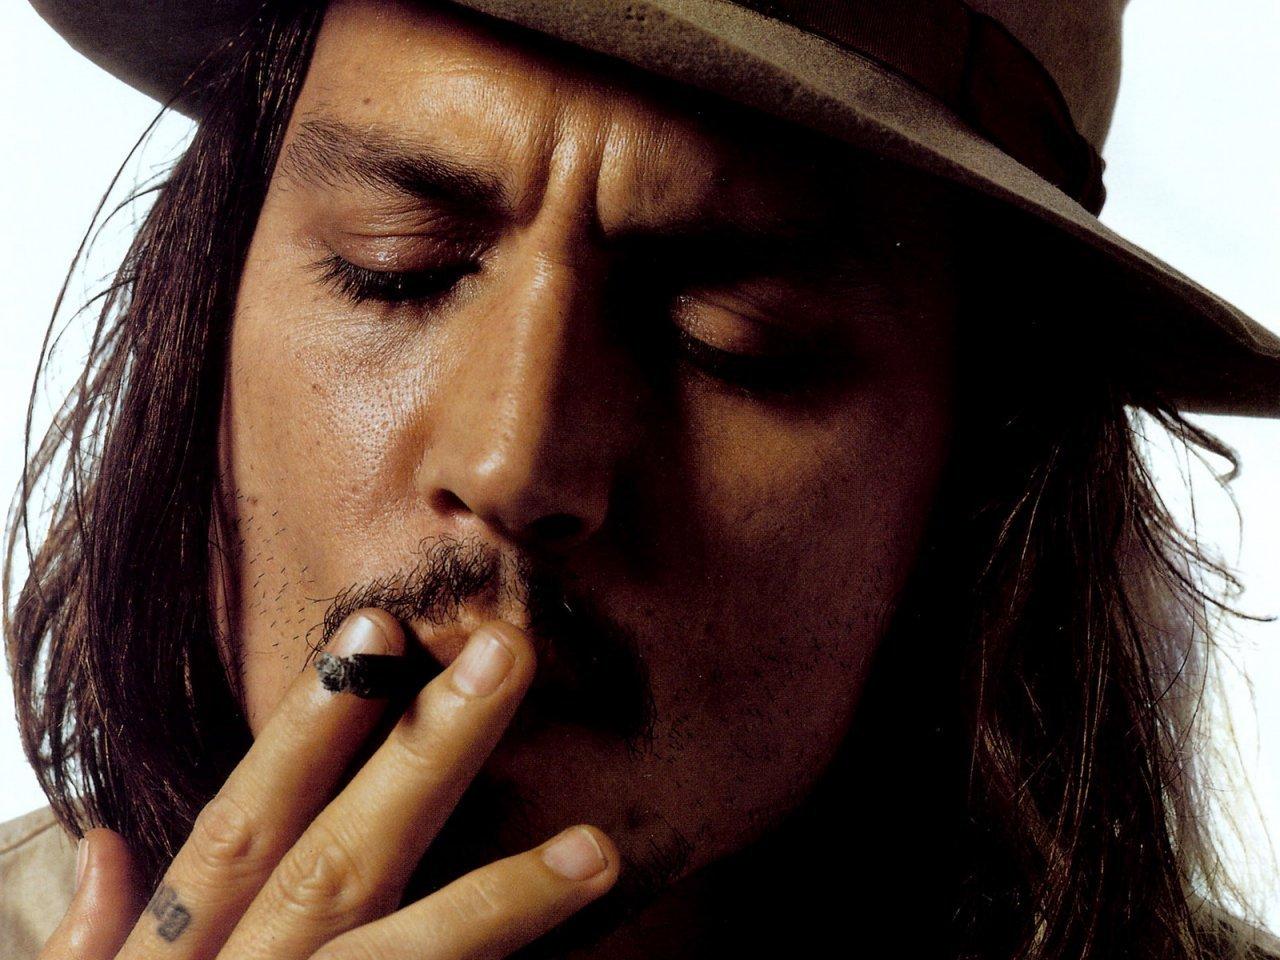 http://3.bp.blogspot.com/-3L99GsXLpgE/ULo04UKyXVI/AAAAAAAAklU/17THxarZI4s/s1600/Johnny-Depp-smoking.jpg